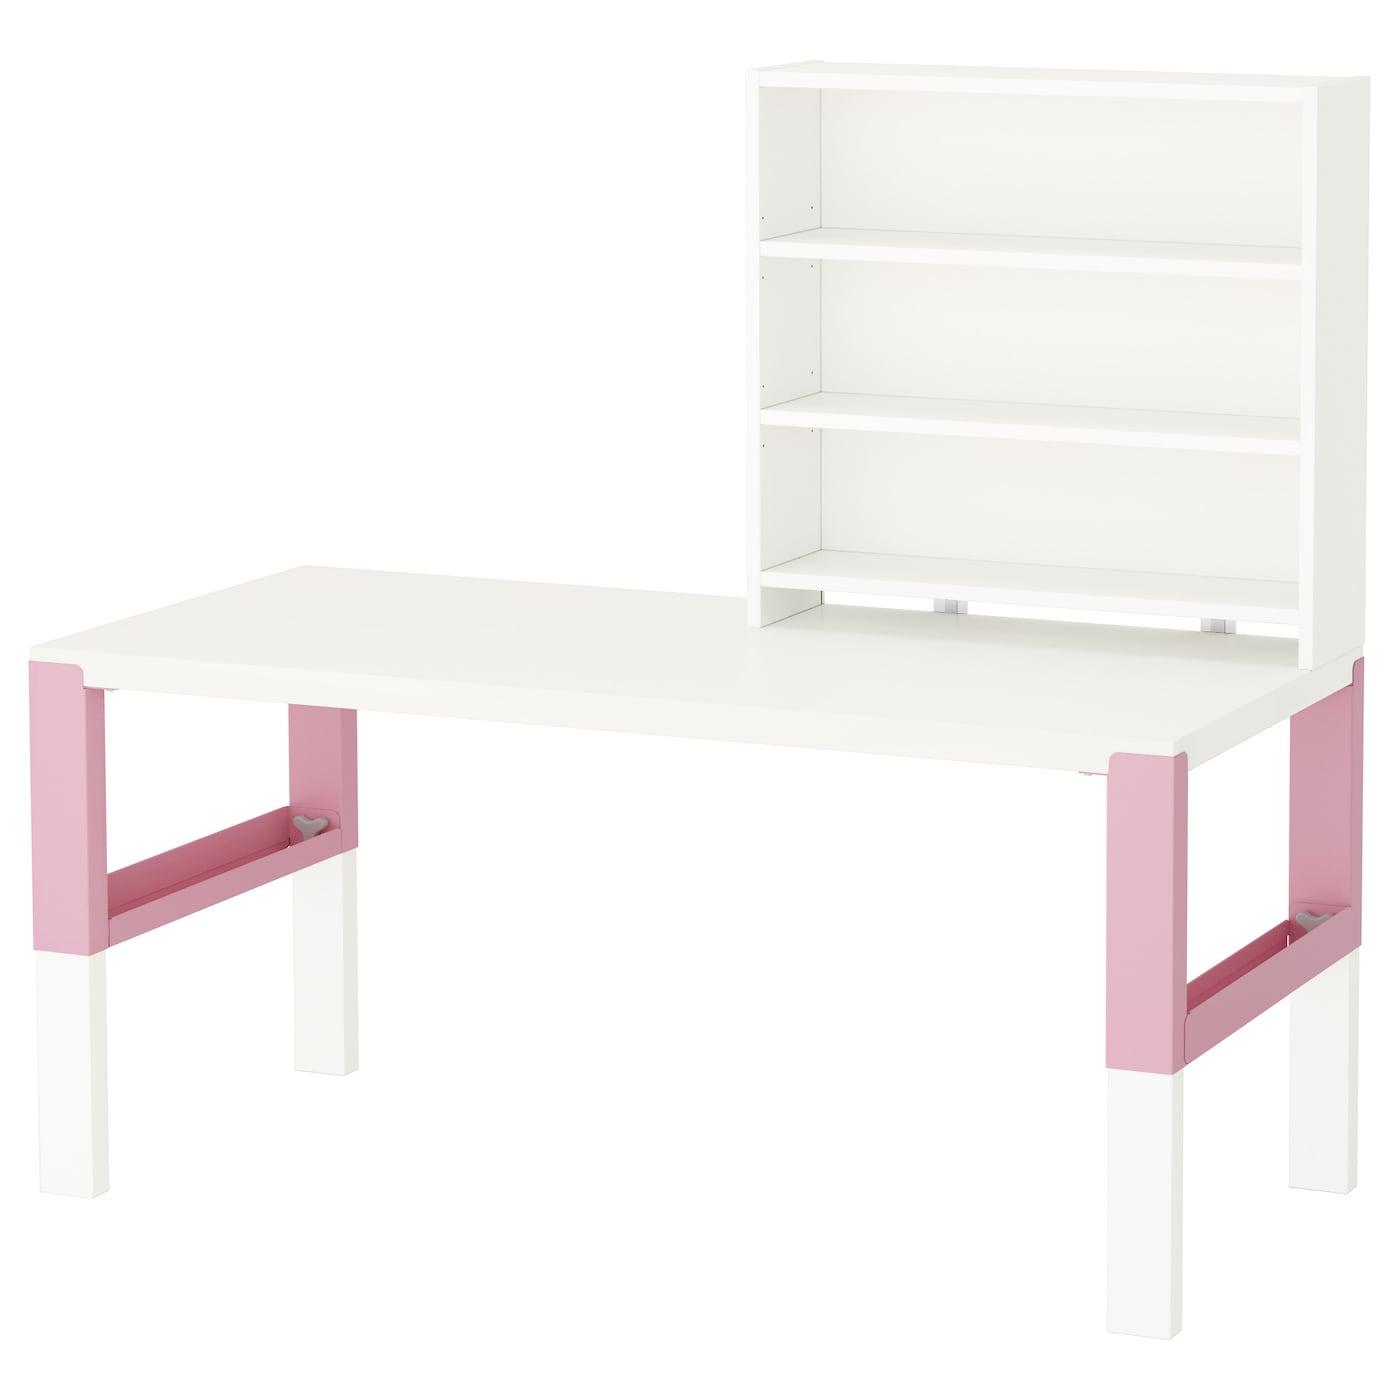 p hl bureau avec tablette blanc rose 128 x 58 cm ikea. Black Bedroom Furniture Sets. Home Design Ideas